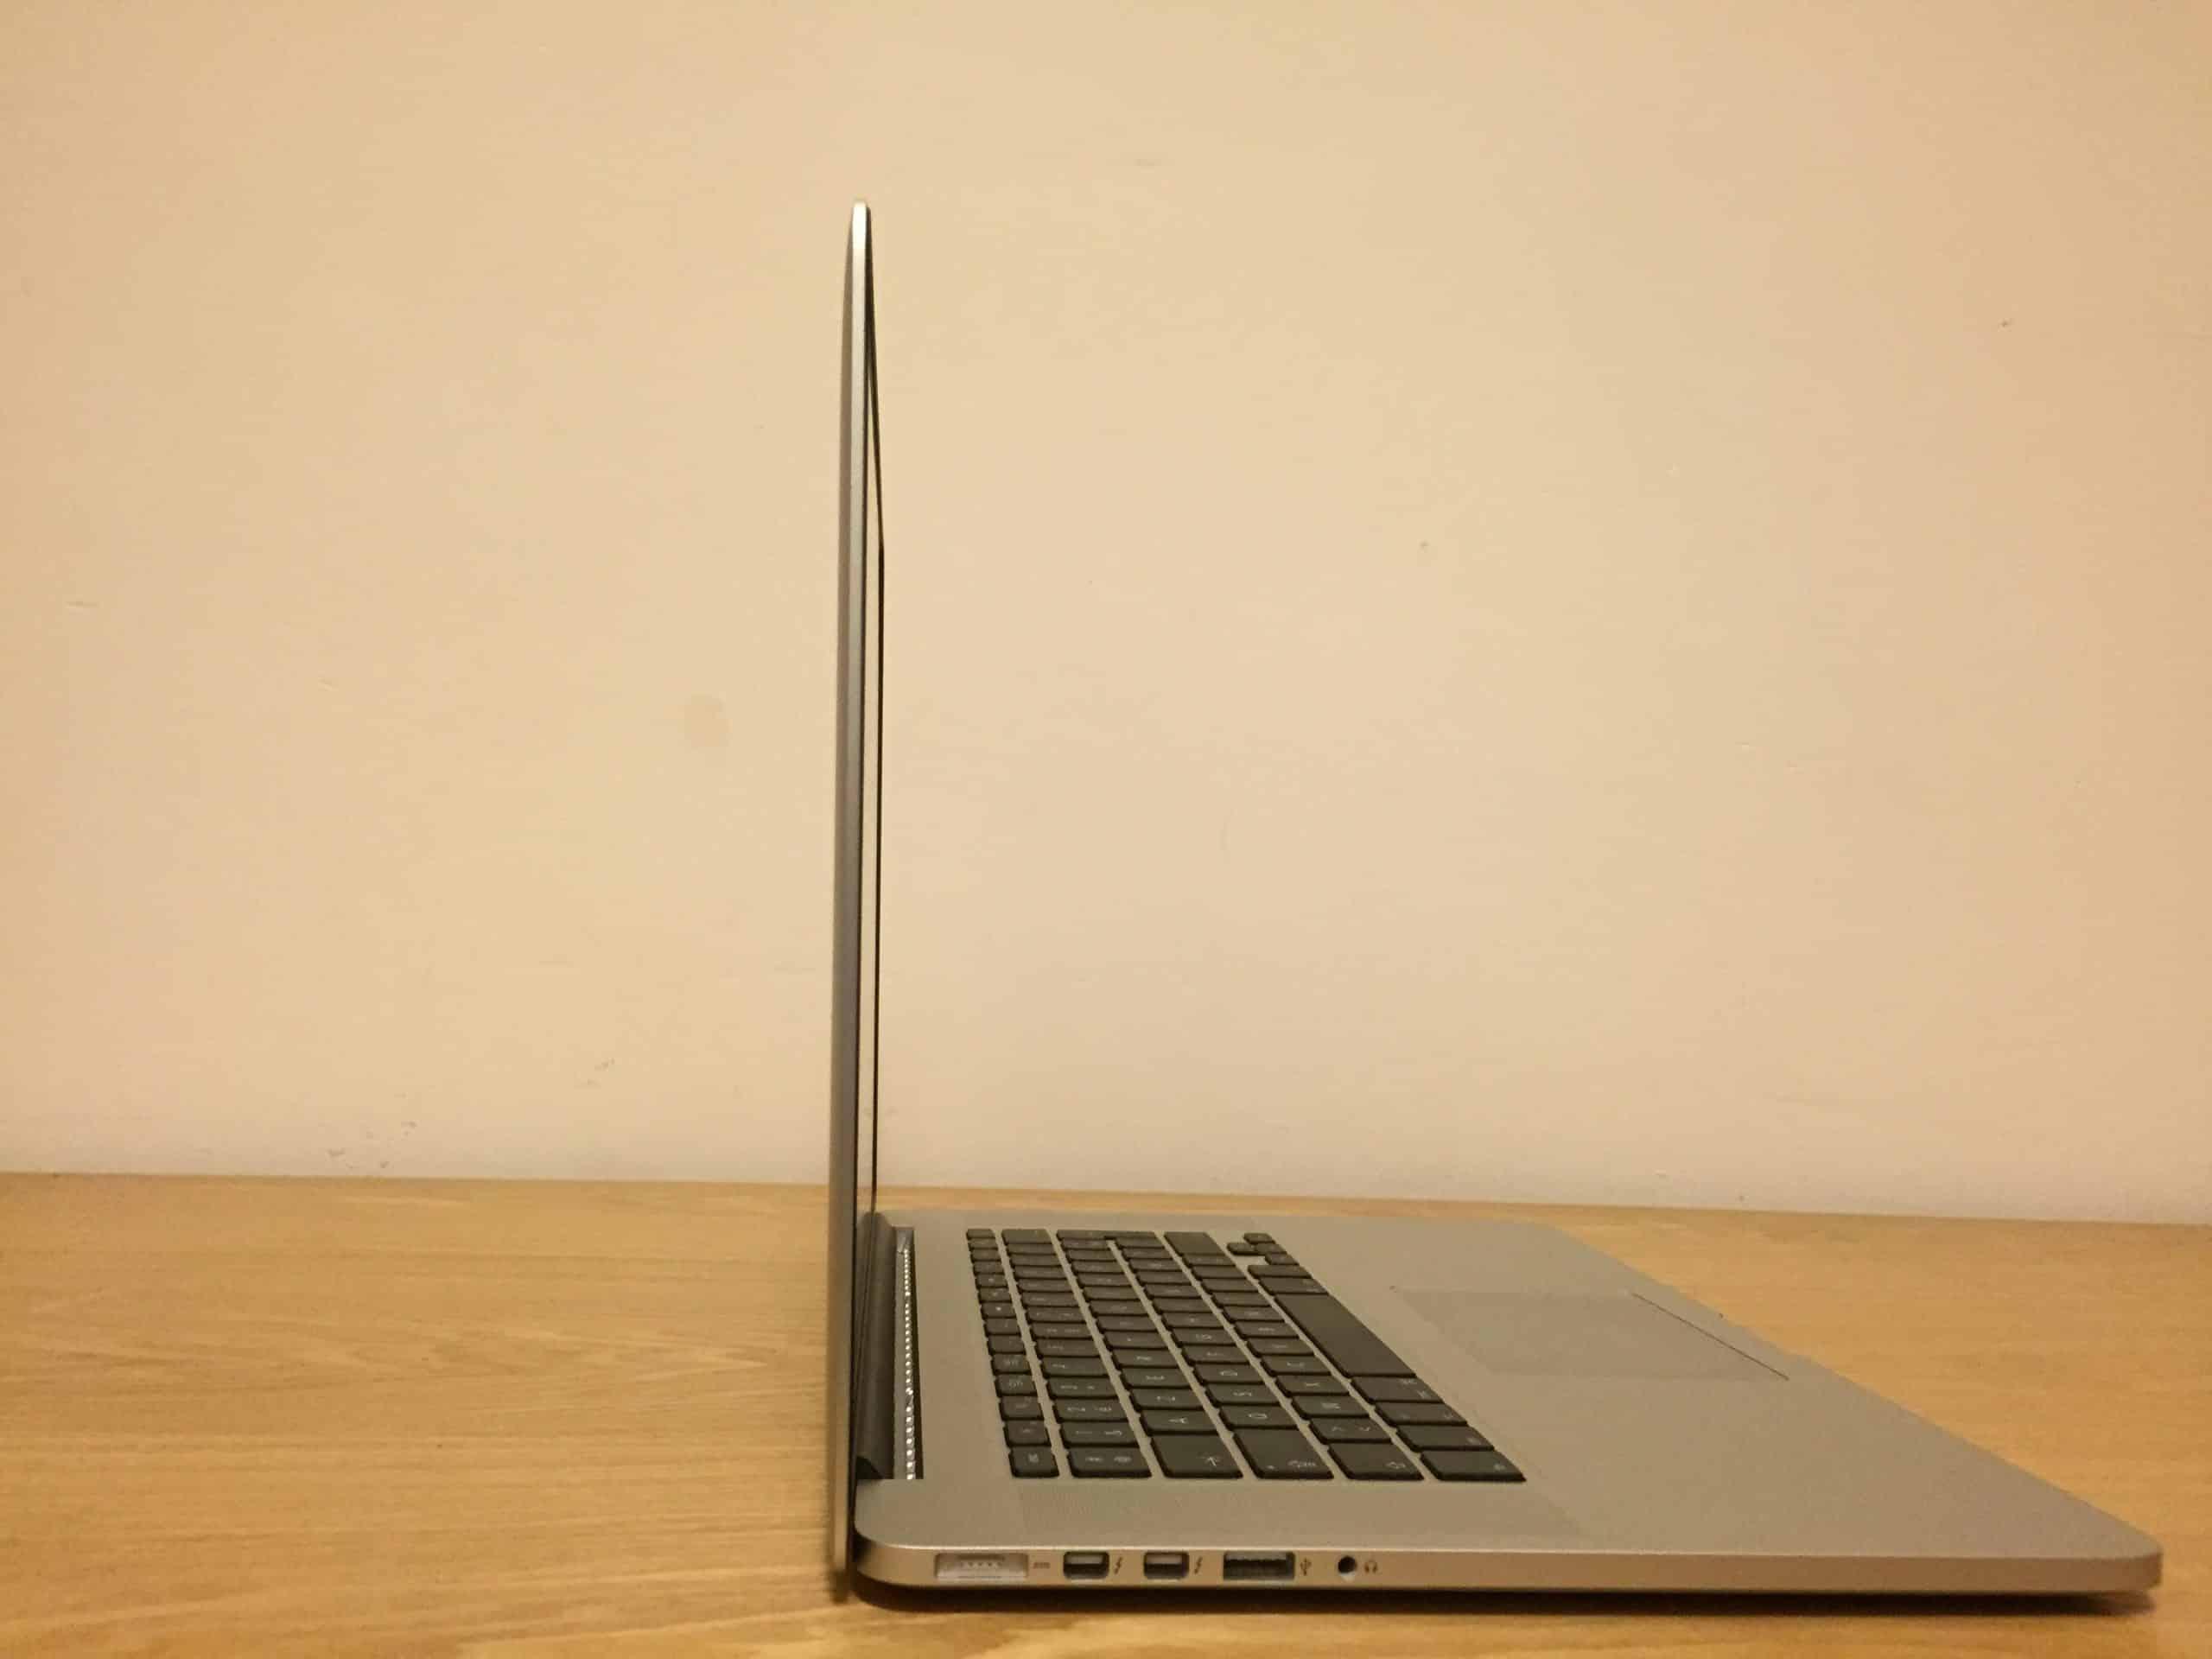 Difference macbook pro macbook pro retina00014